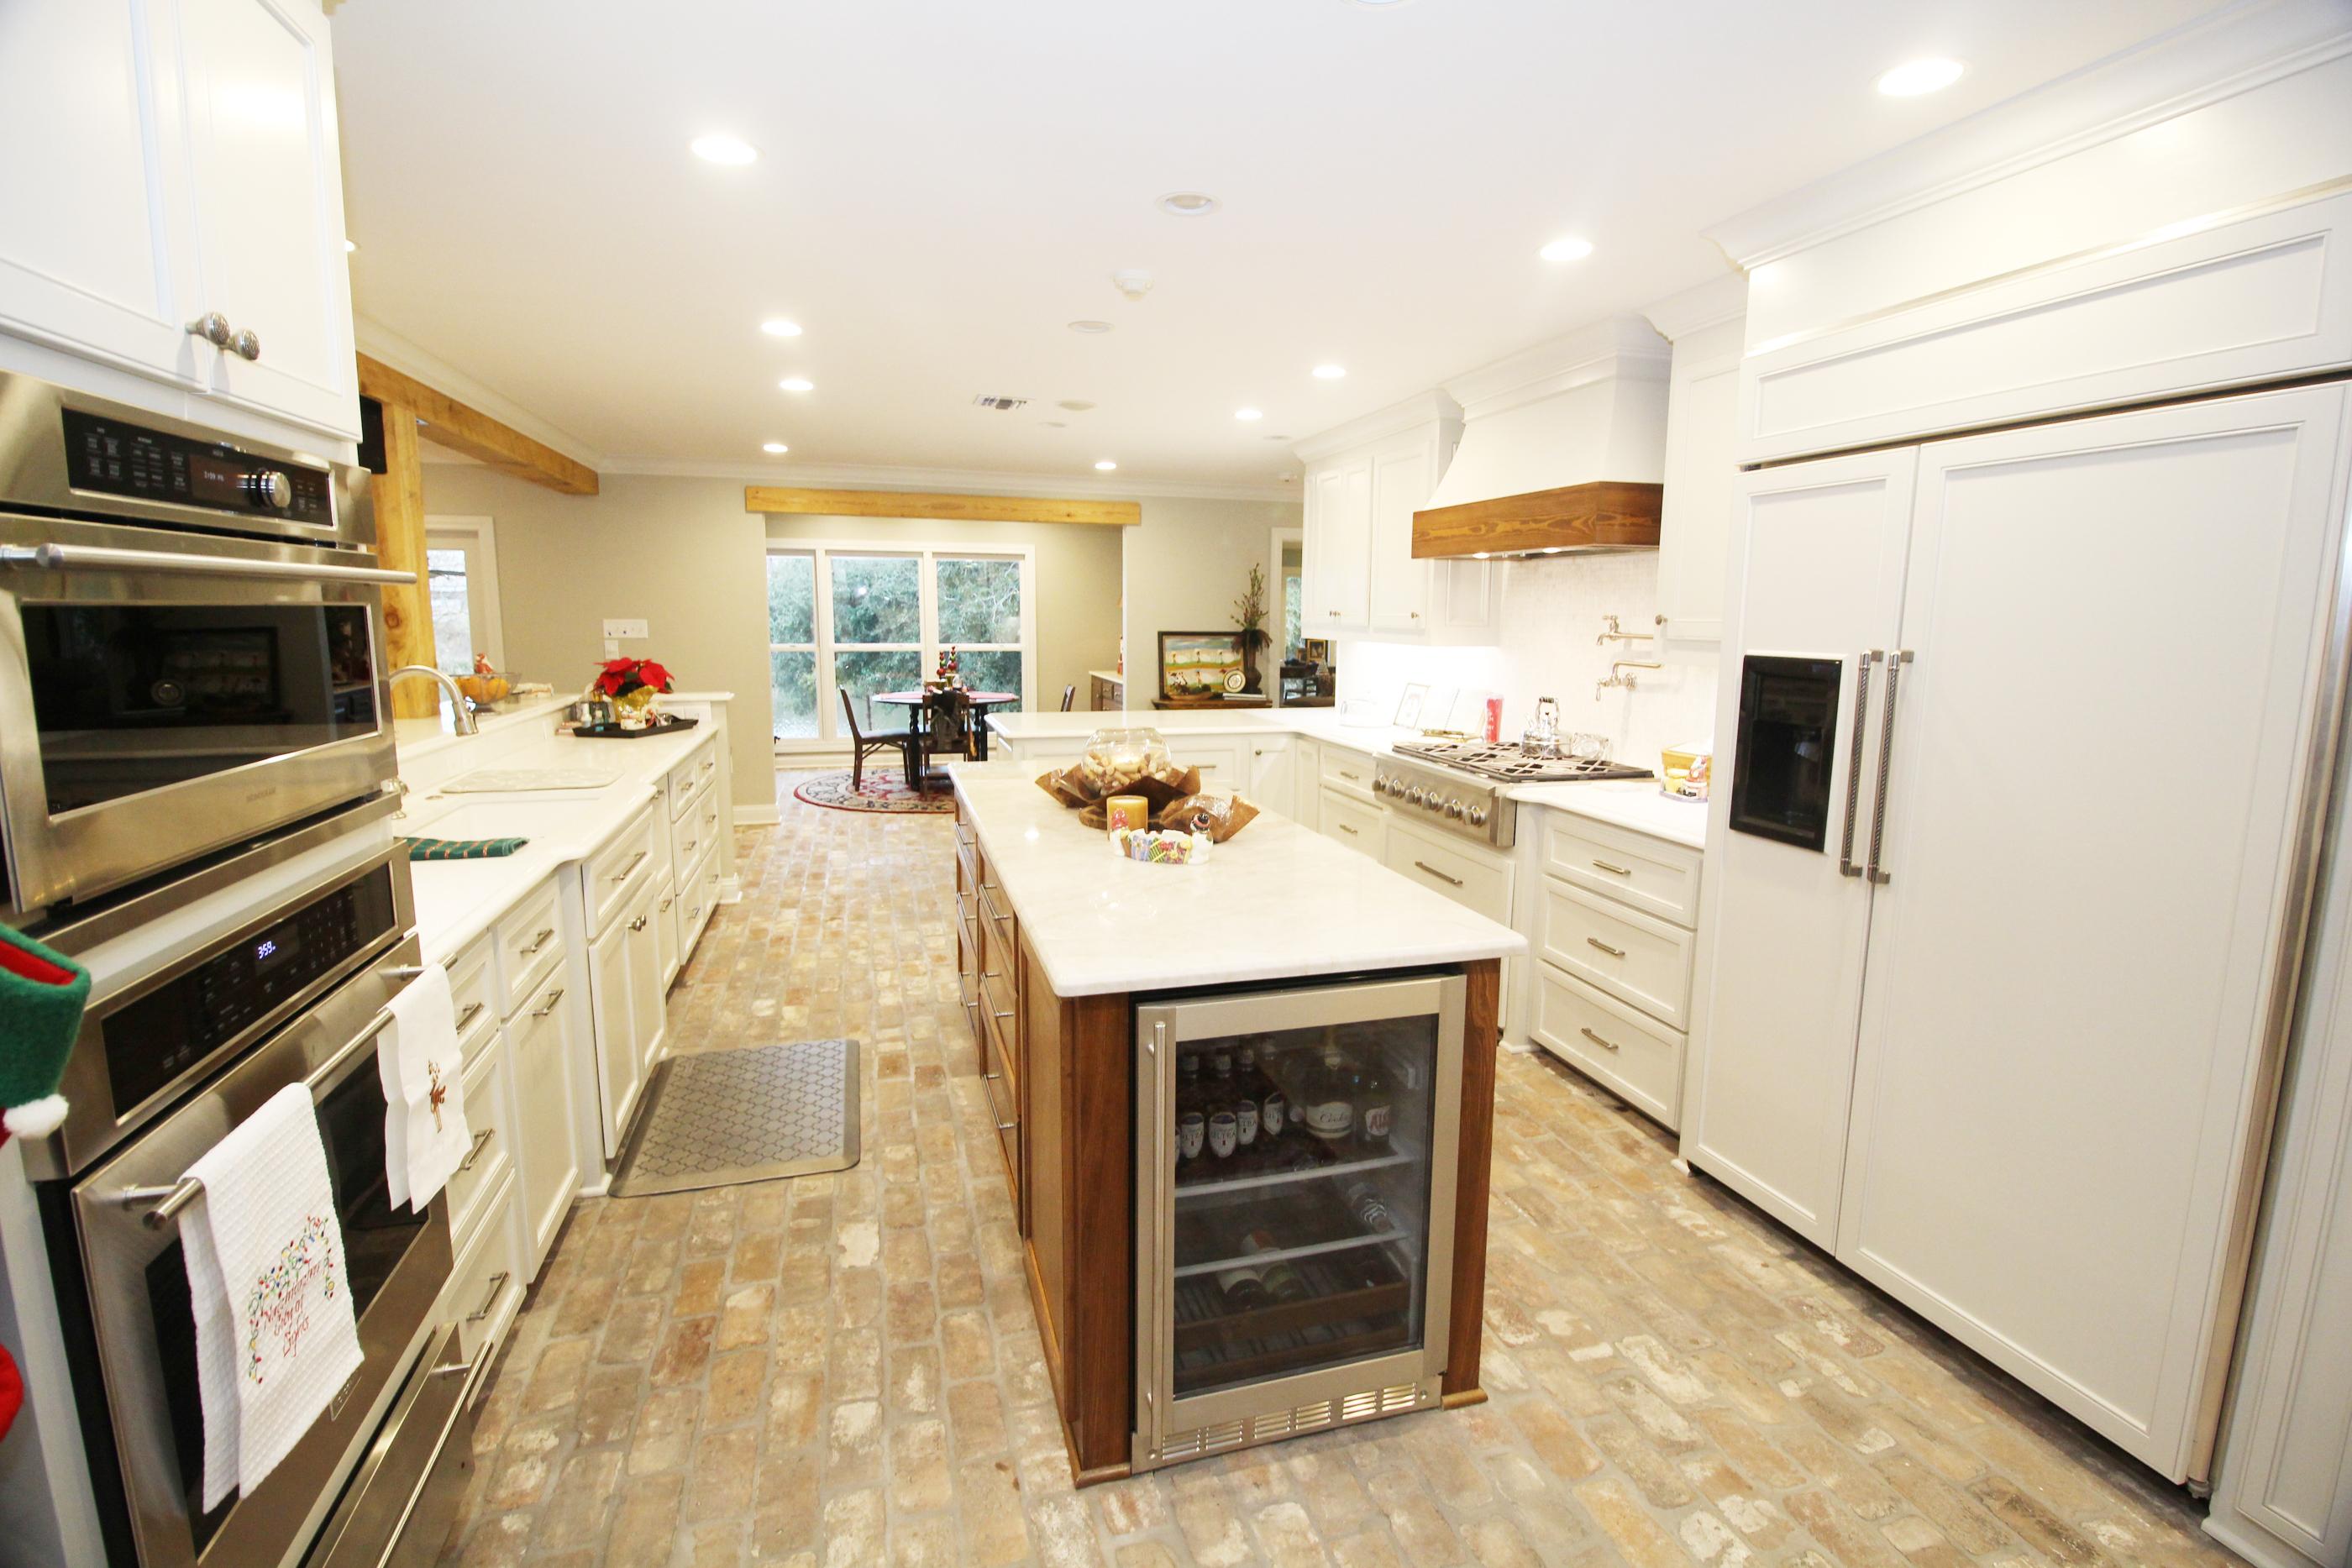 Showcase Homes & Remodeling LLC image 4